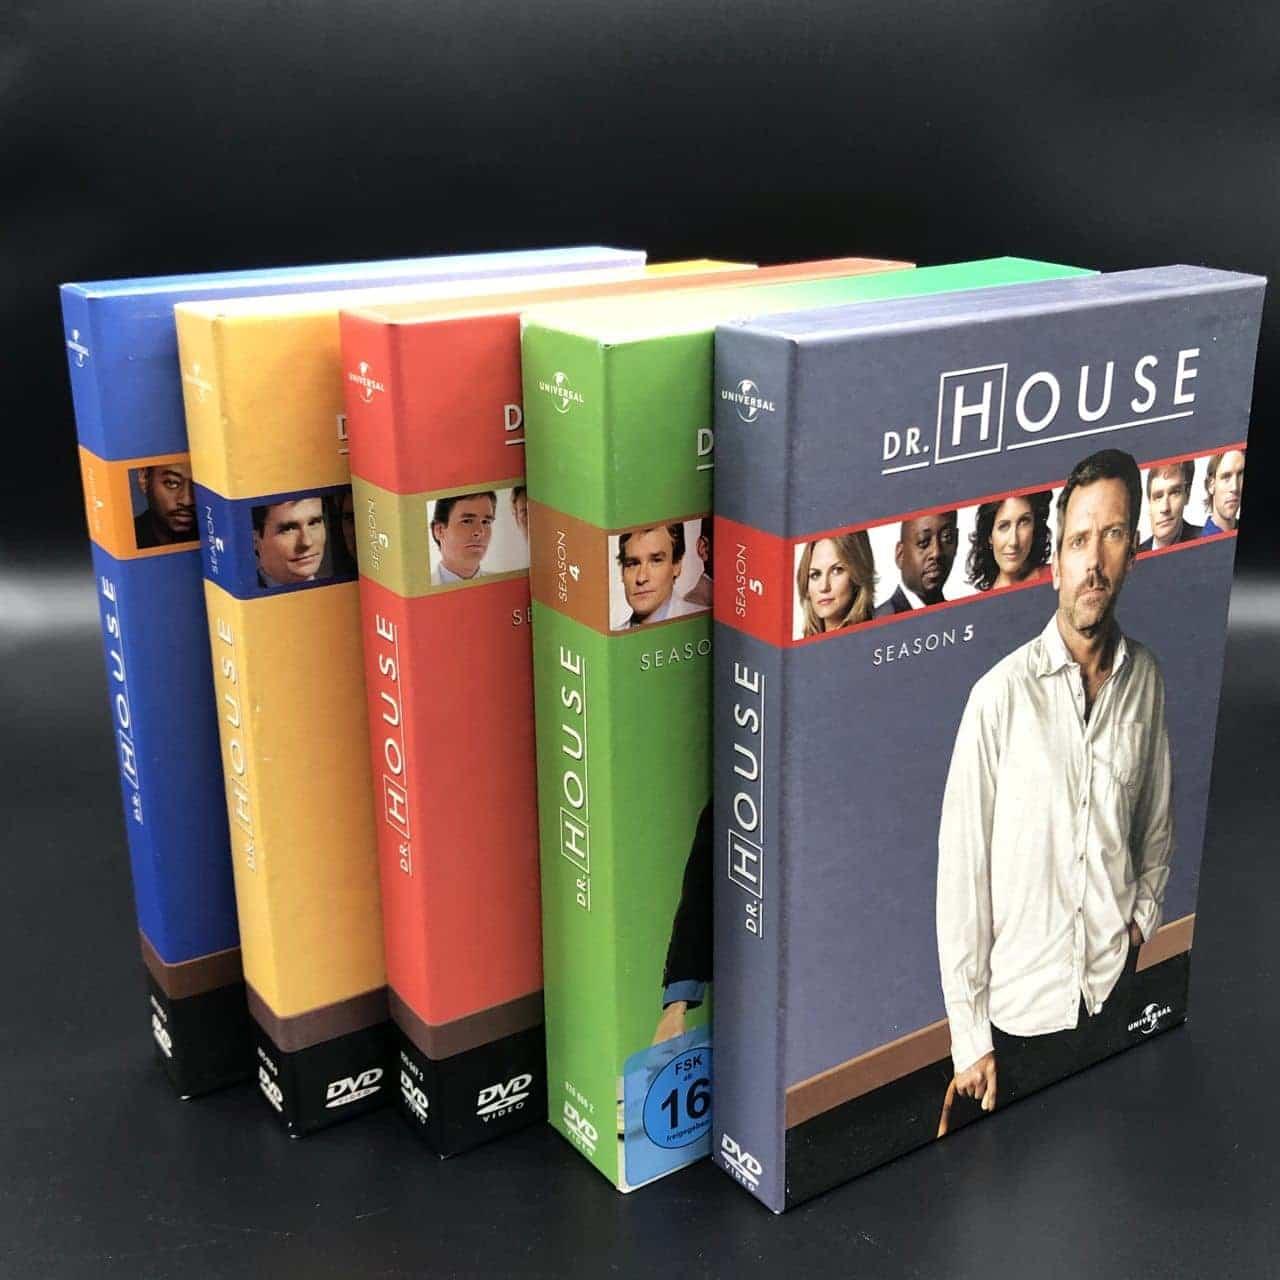 Dr. House Serie, Staffel 1-5, DVD